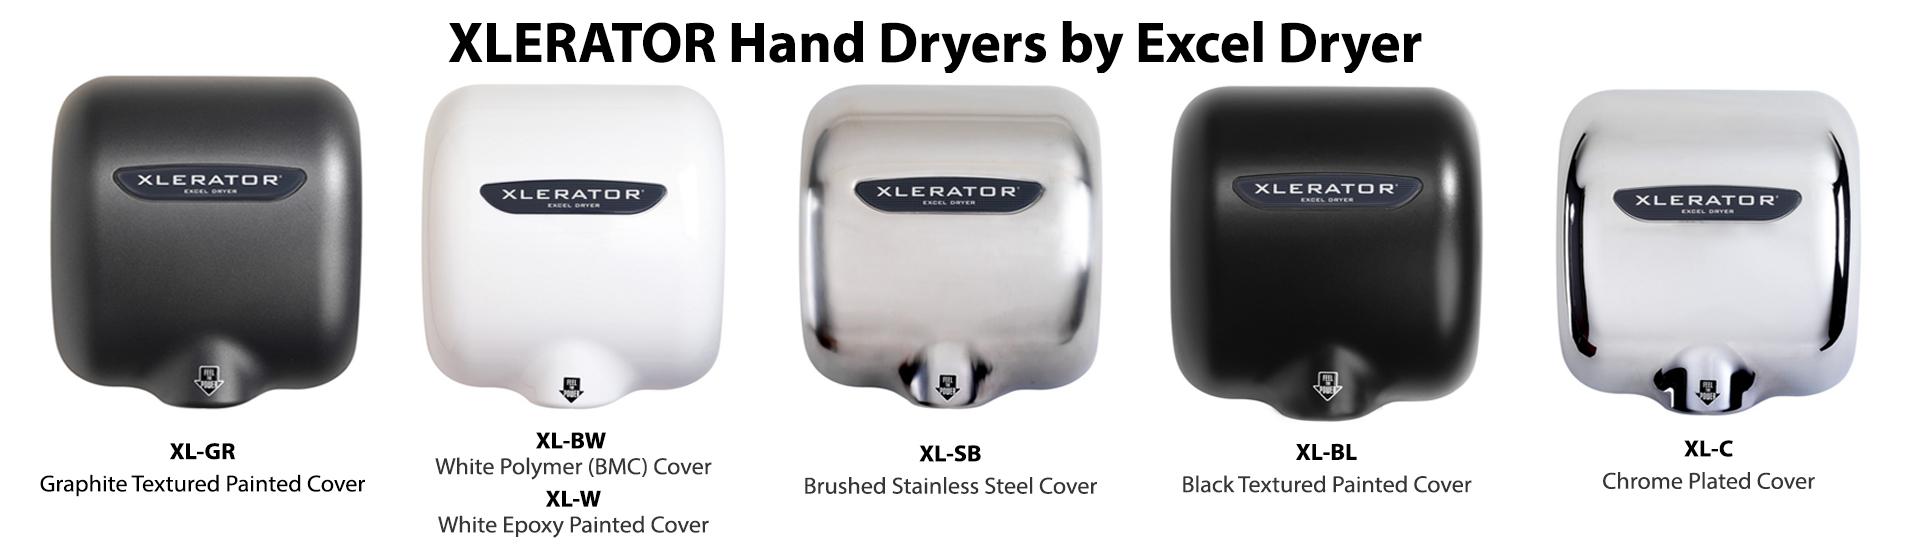 Xlerator Hand Dryers